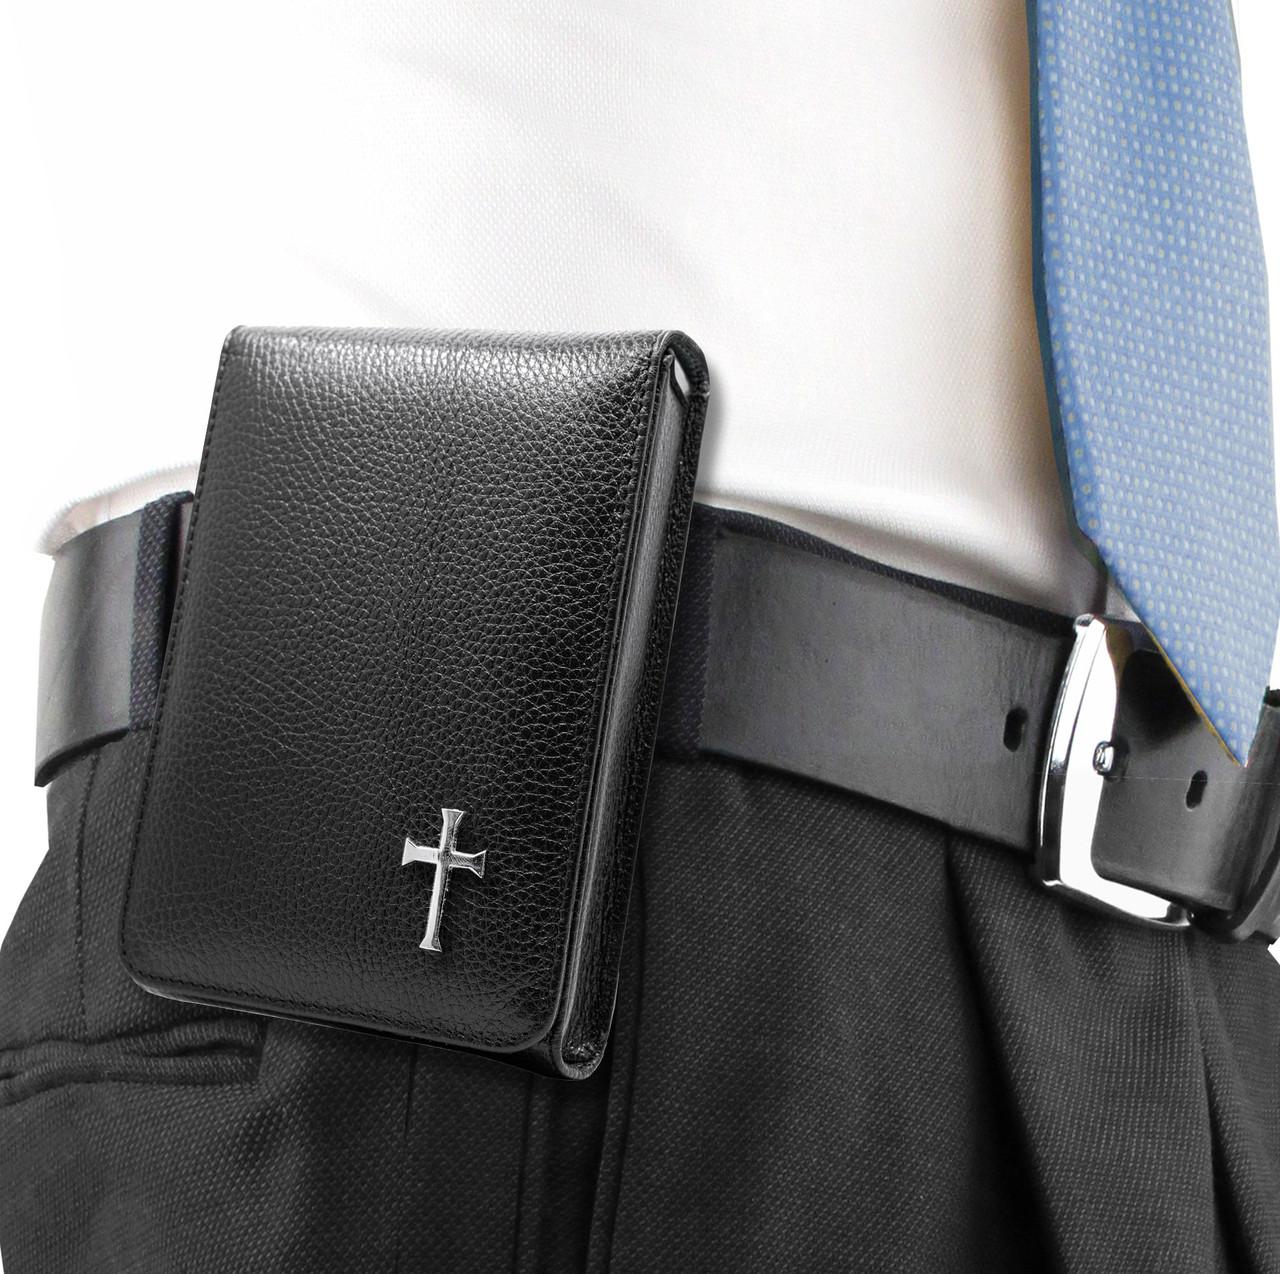 Mossberg MC1SC Black Leather Cross Series Holster